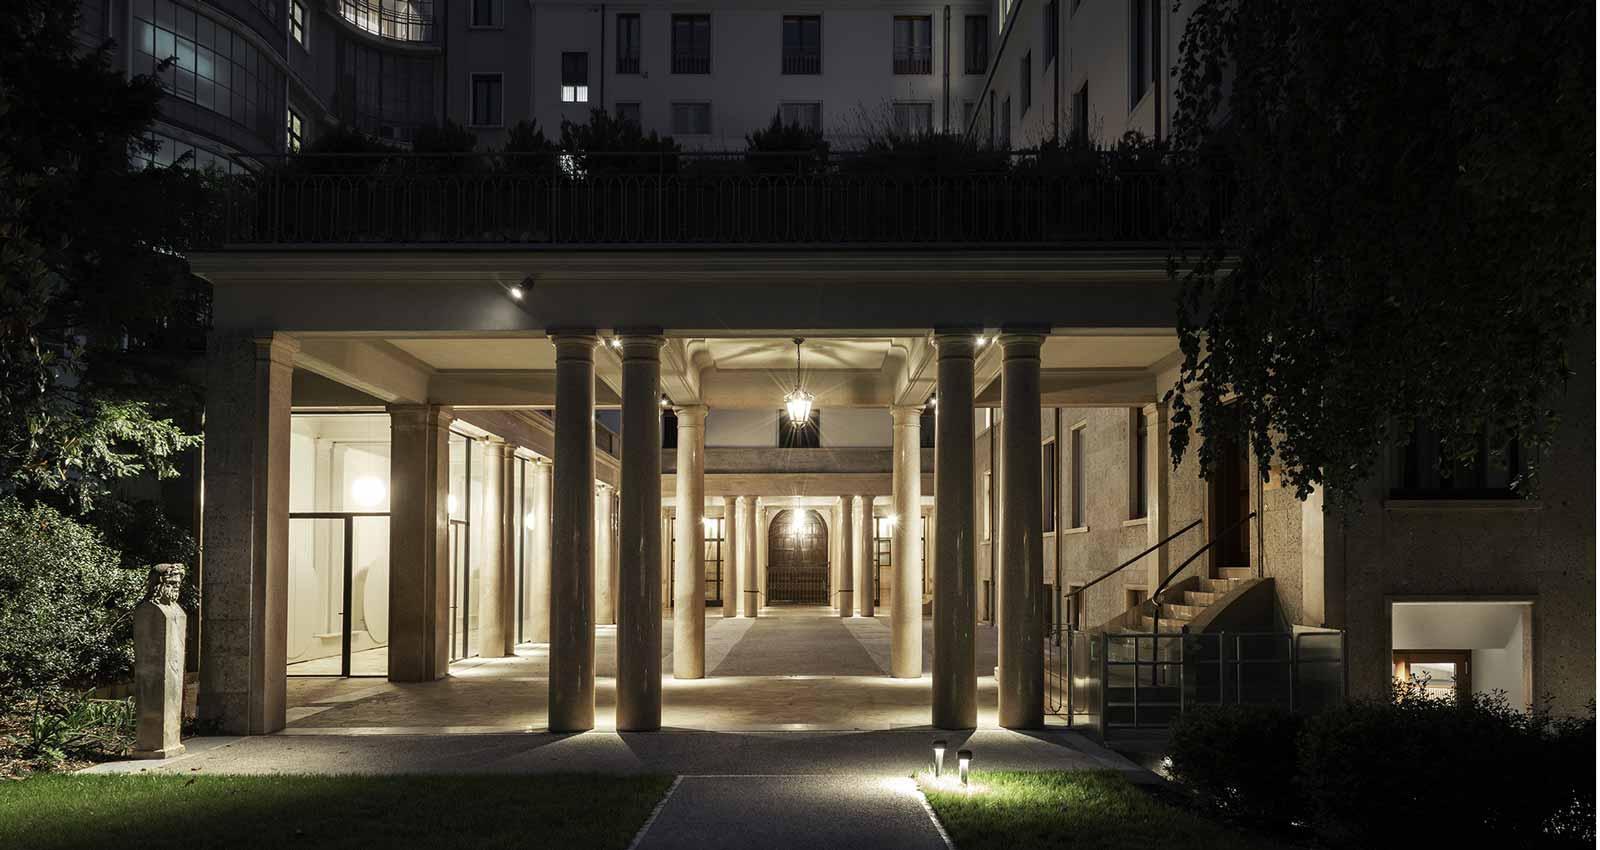 Stone Effect Stoneware For Openspaces Rich In Textured Splendour Marazzi